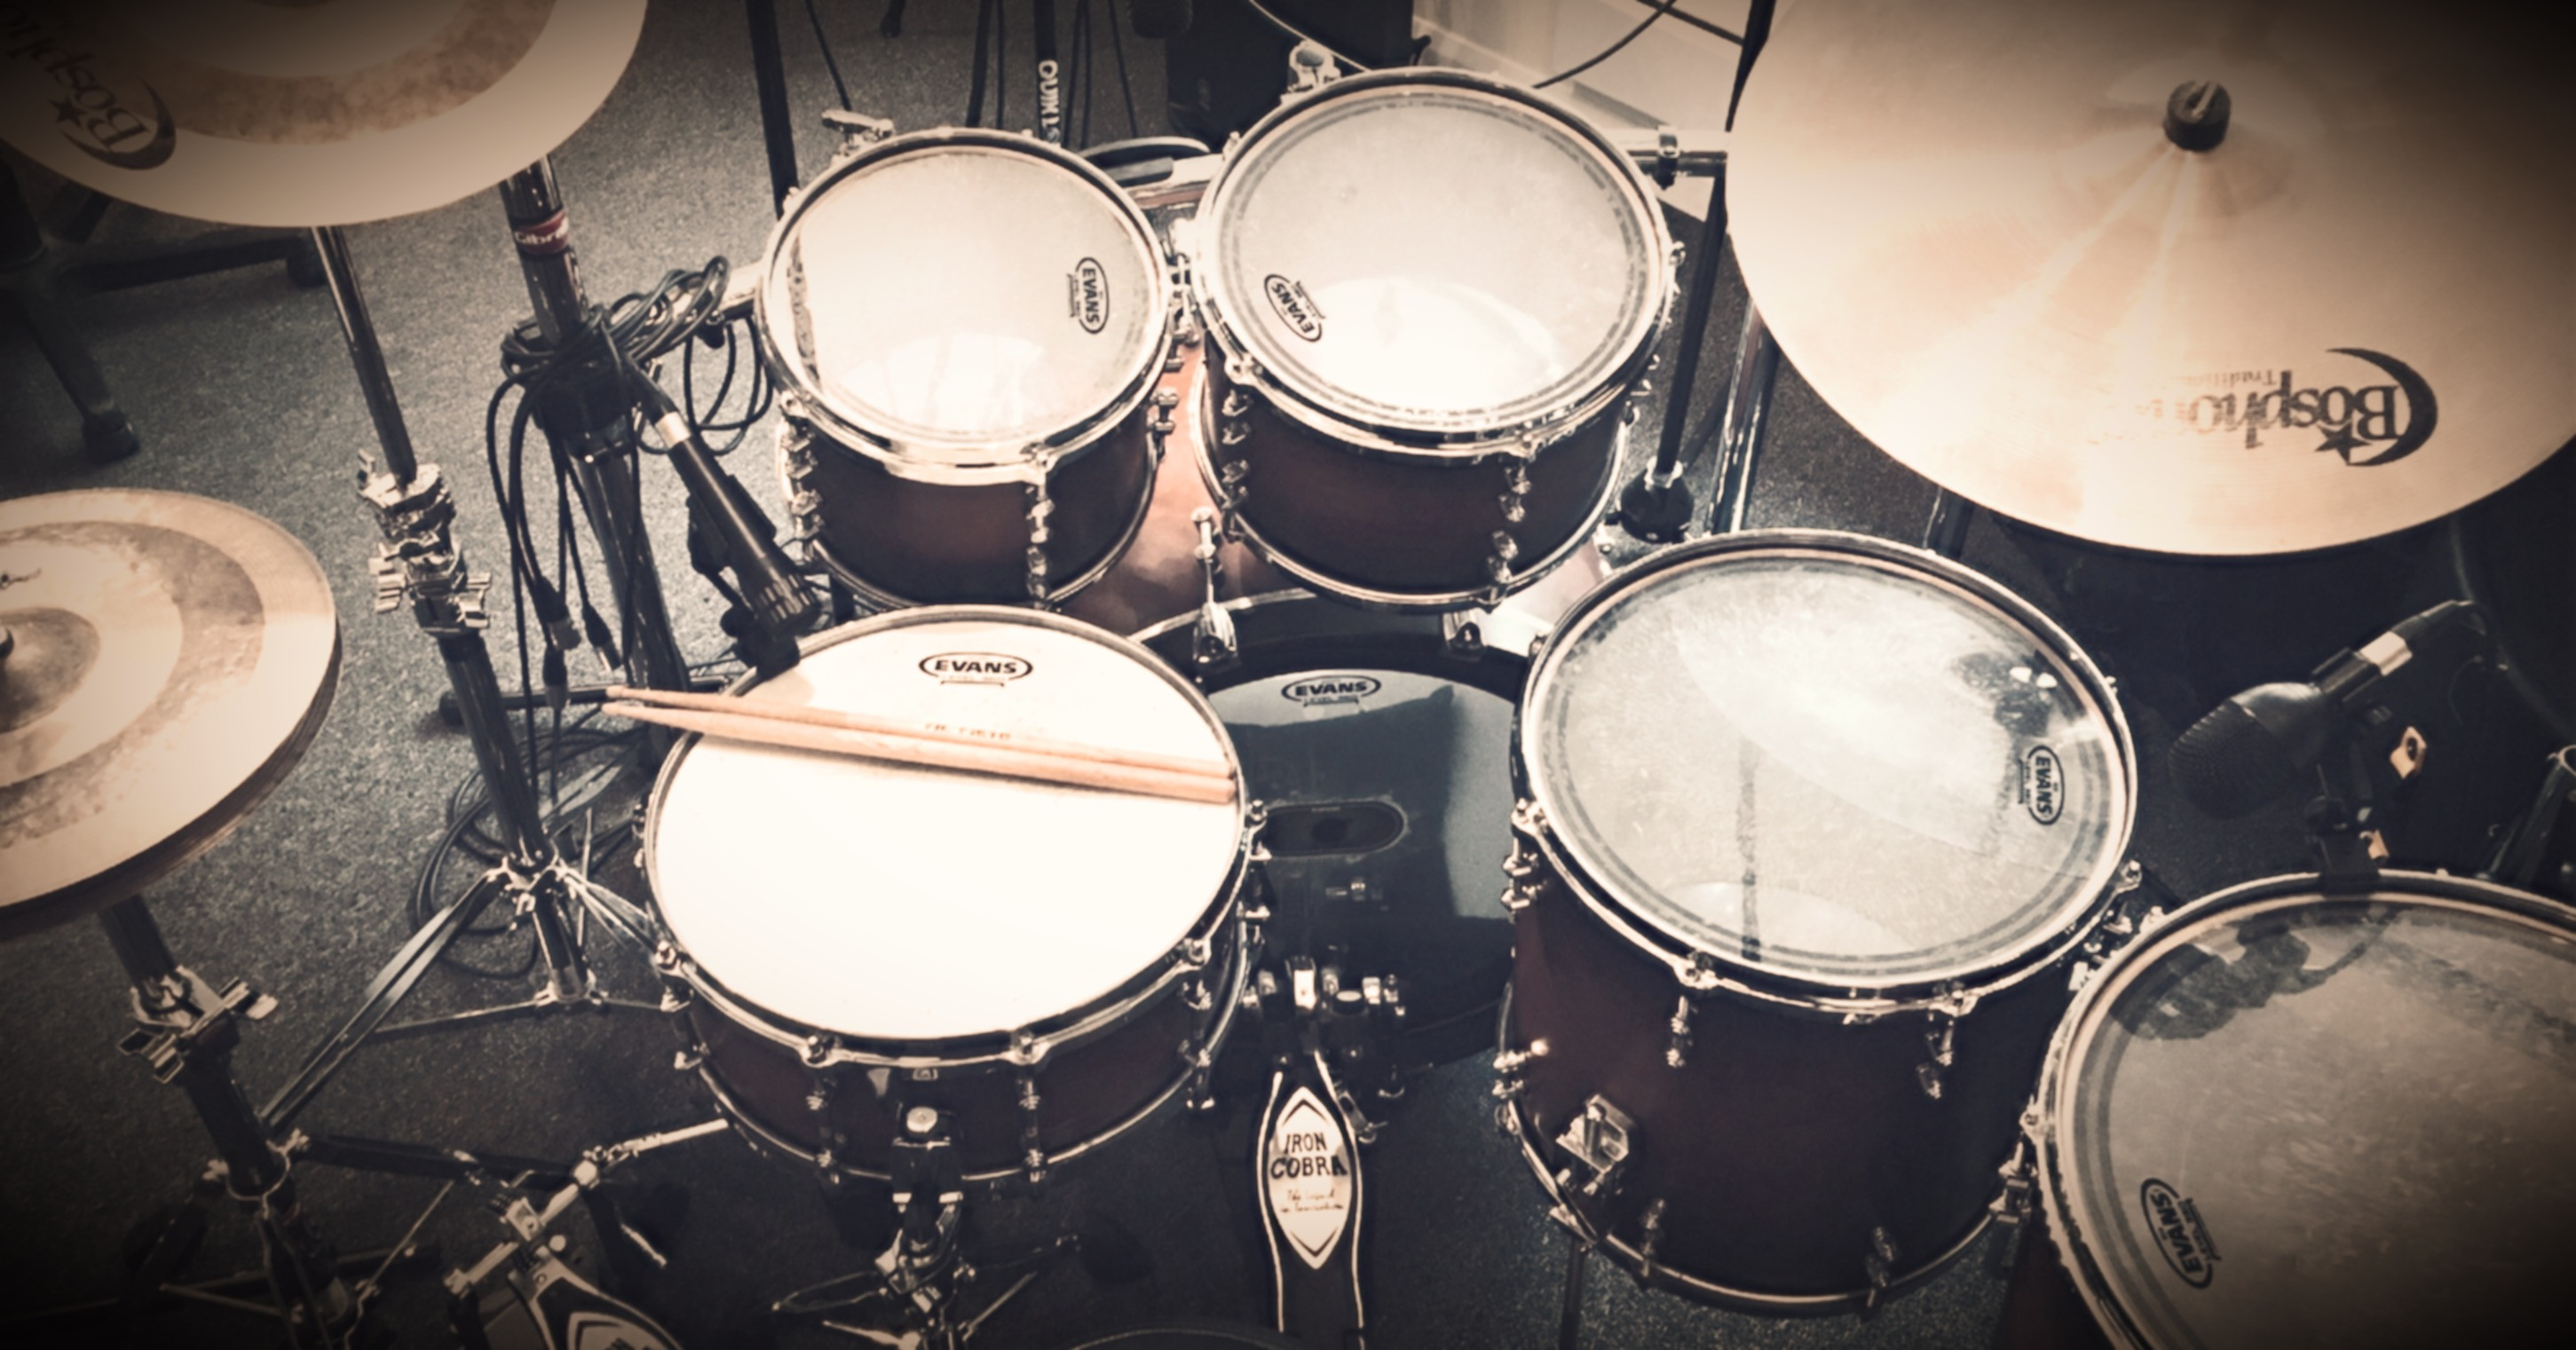 Drum Lesson (In Studio) - One Hour